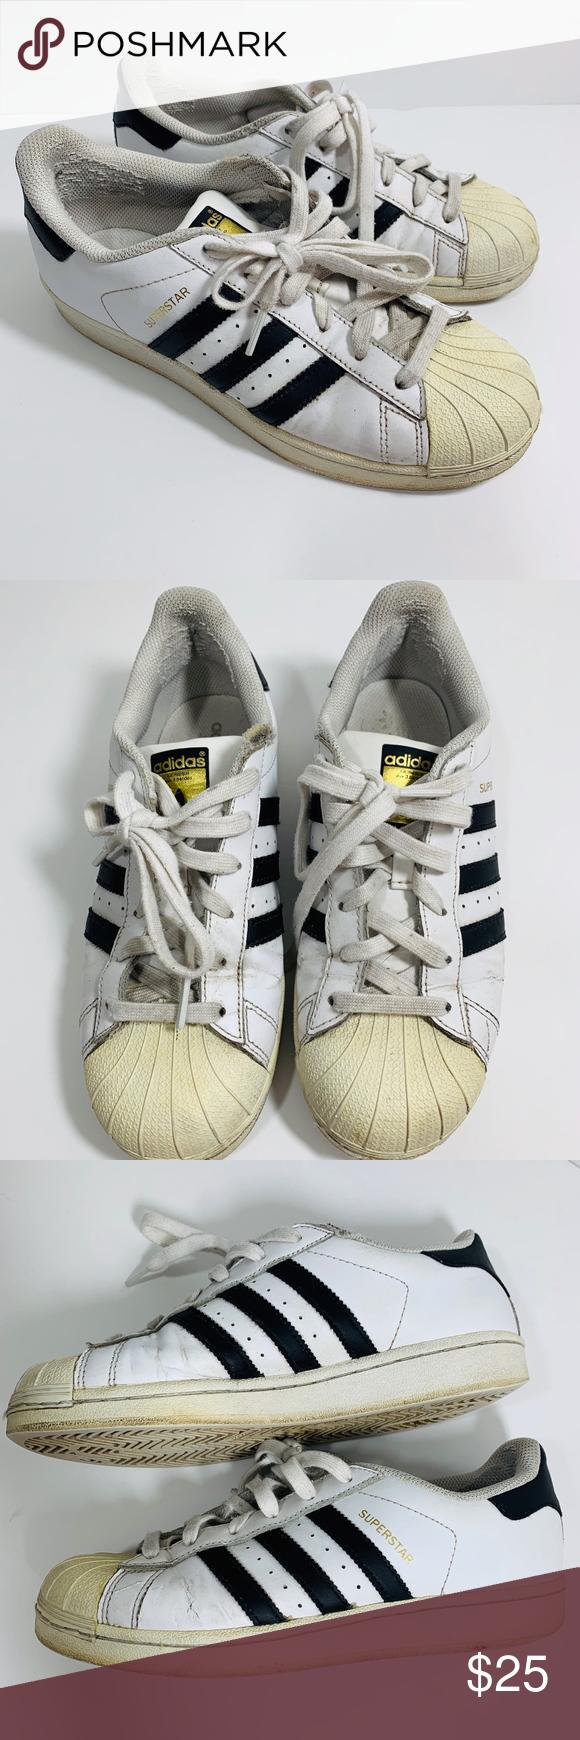 Adidas Superstar Sneakers White 7 | Sneakers white, Adidas ...